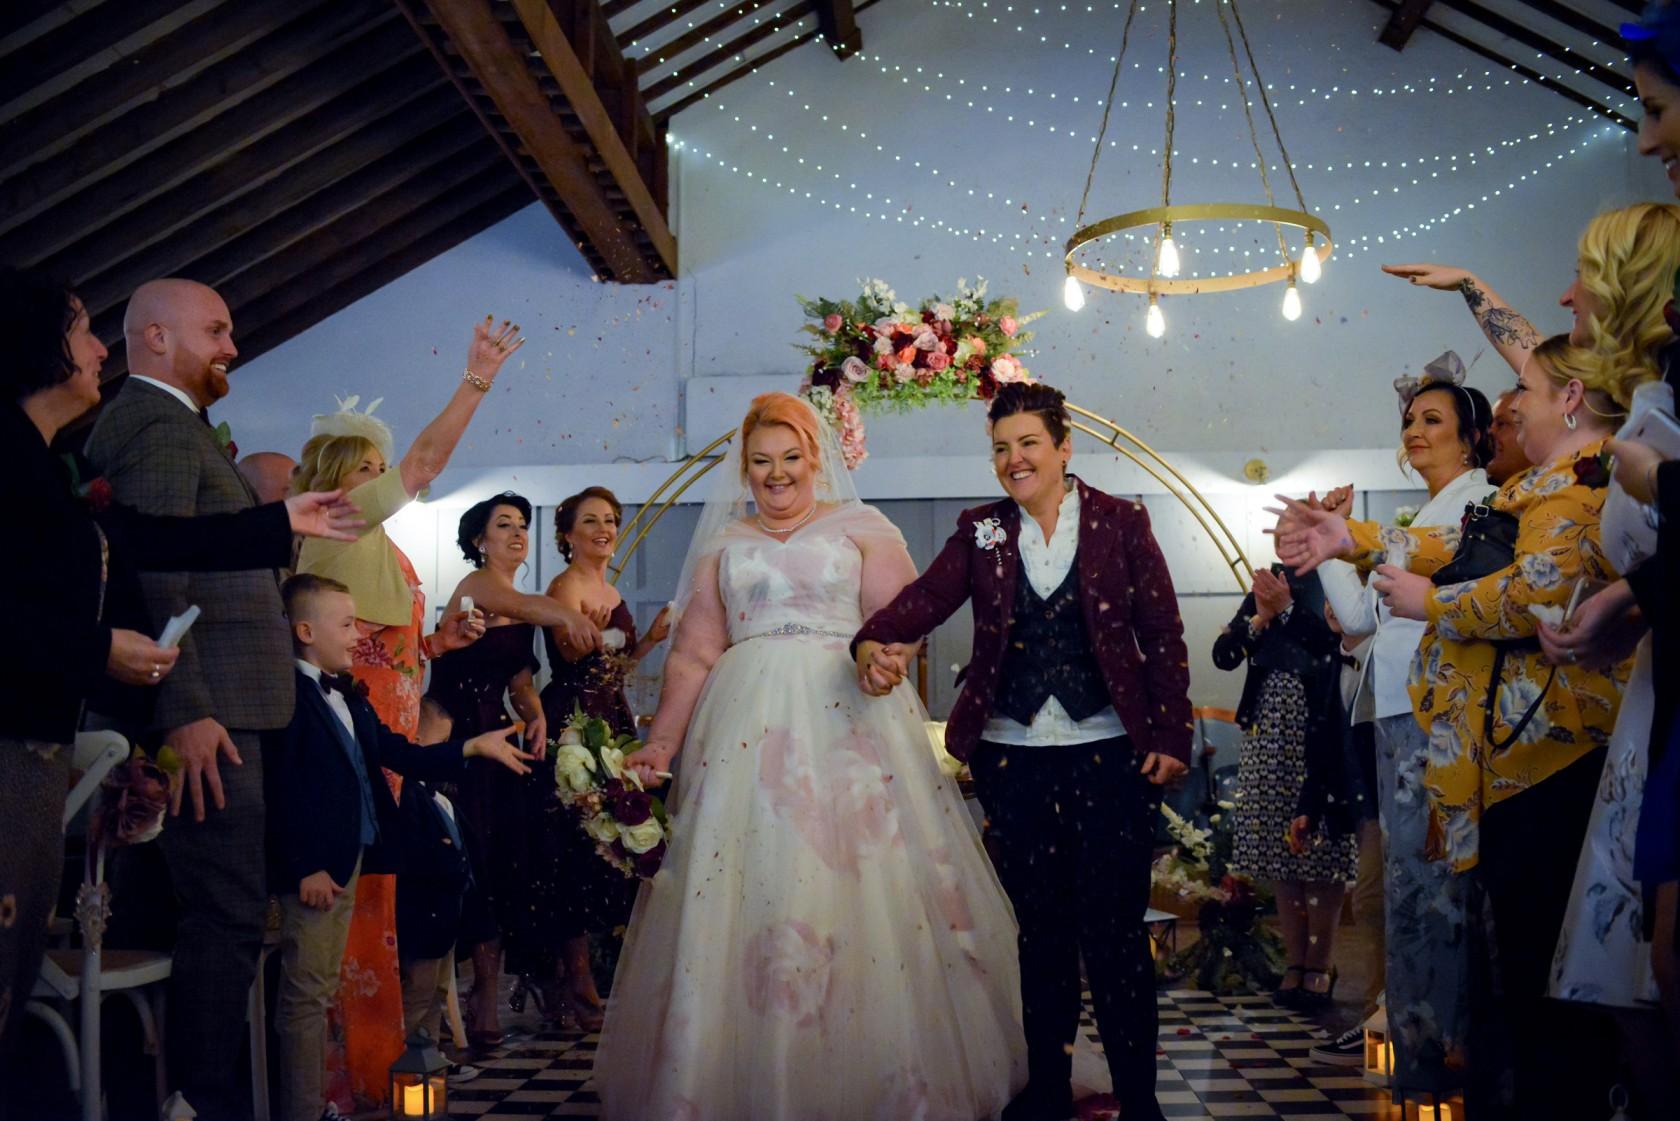 wedding confetti shot - wonderland wedding - real wedding inspiration - DIY wedding - romantic wedding - same sex wedding - lgbtq wedding - unconventional wedding